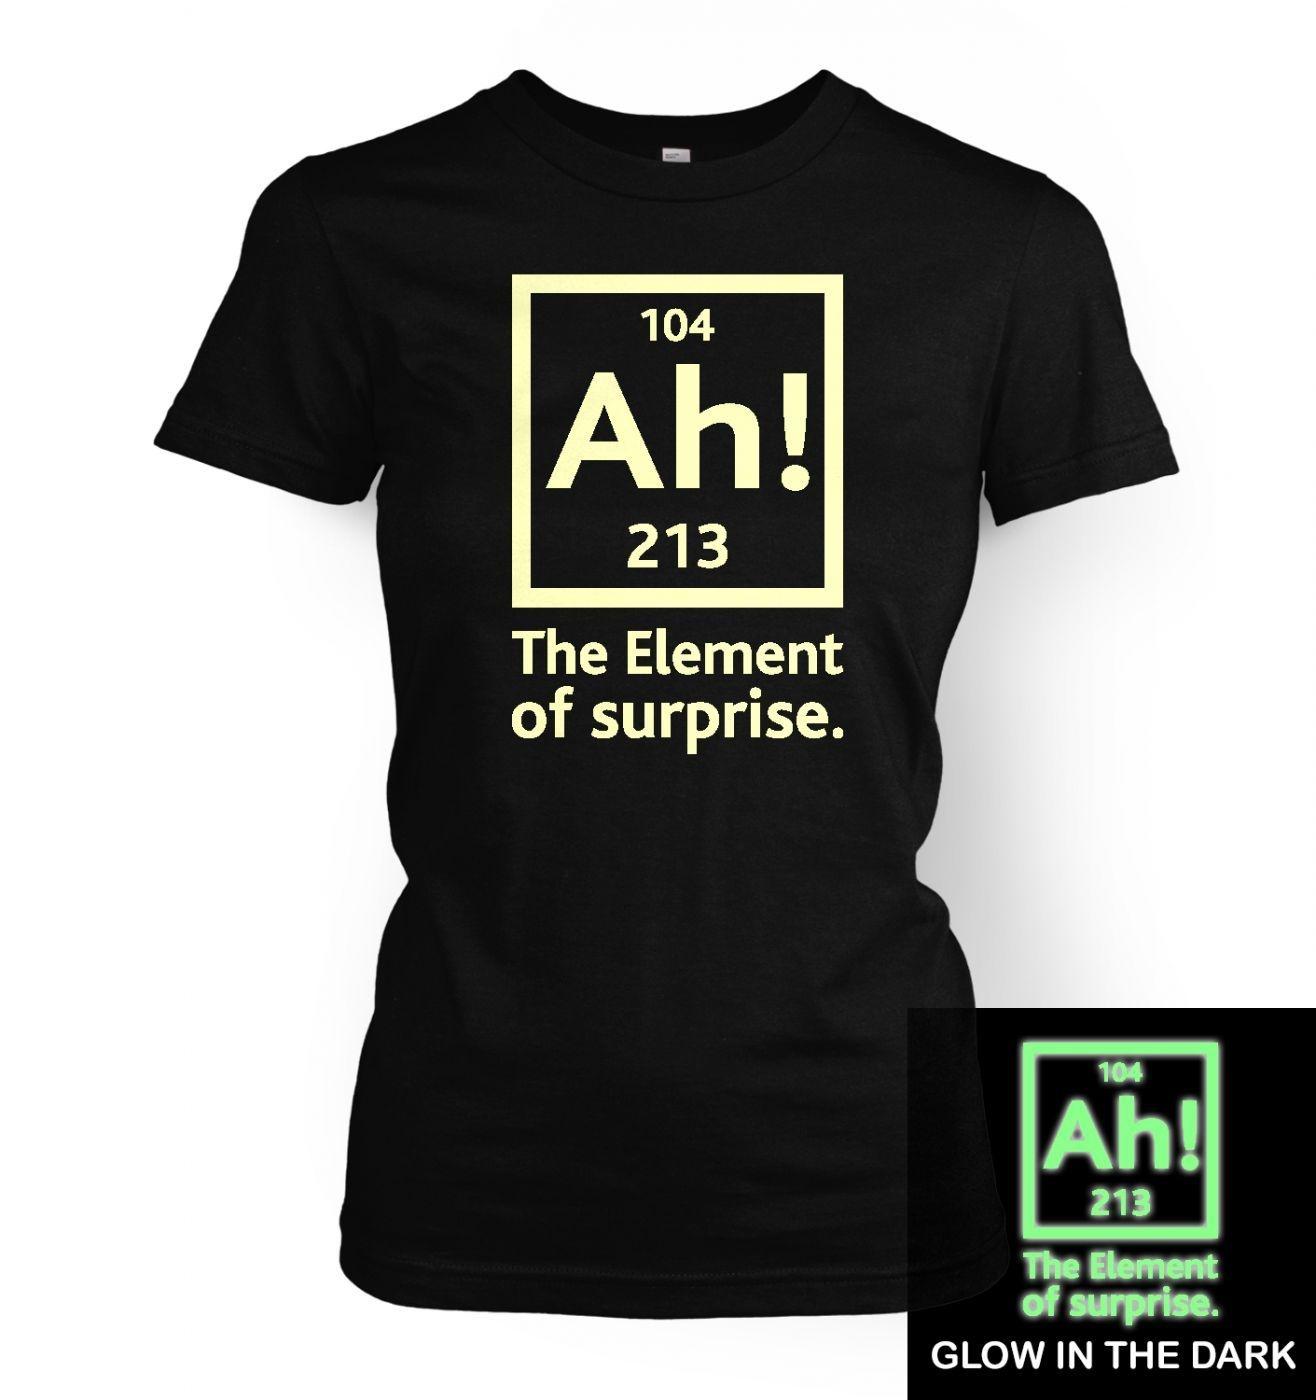 cd9348797 Ah! The Element of Surprise (glow in the dark) women's t-shirt ...